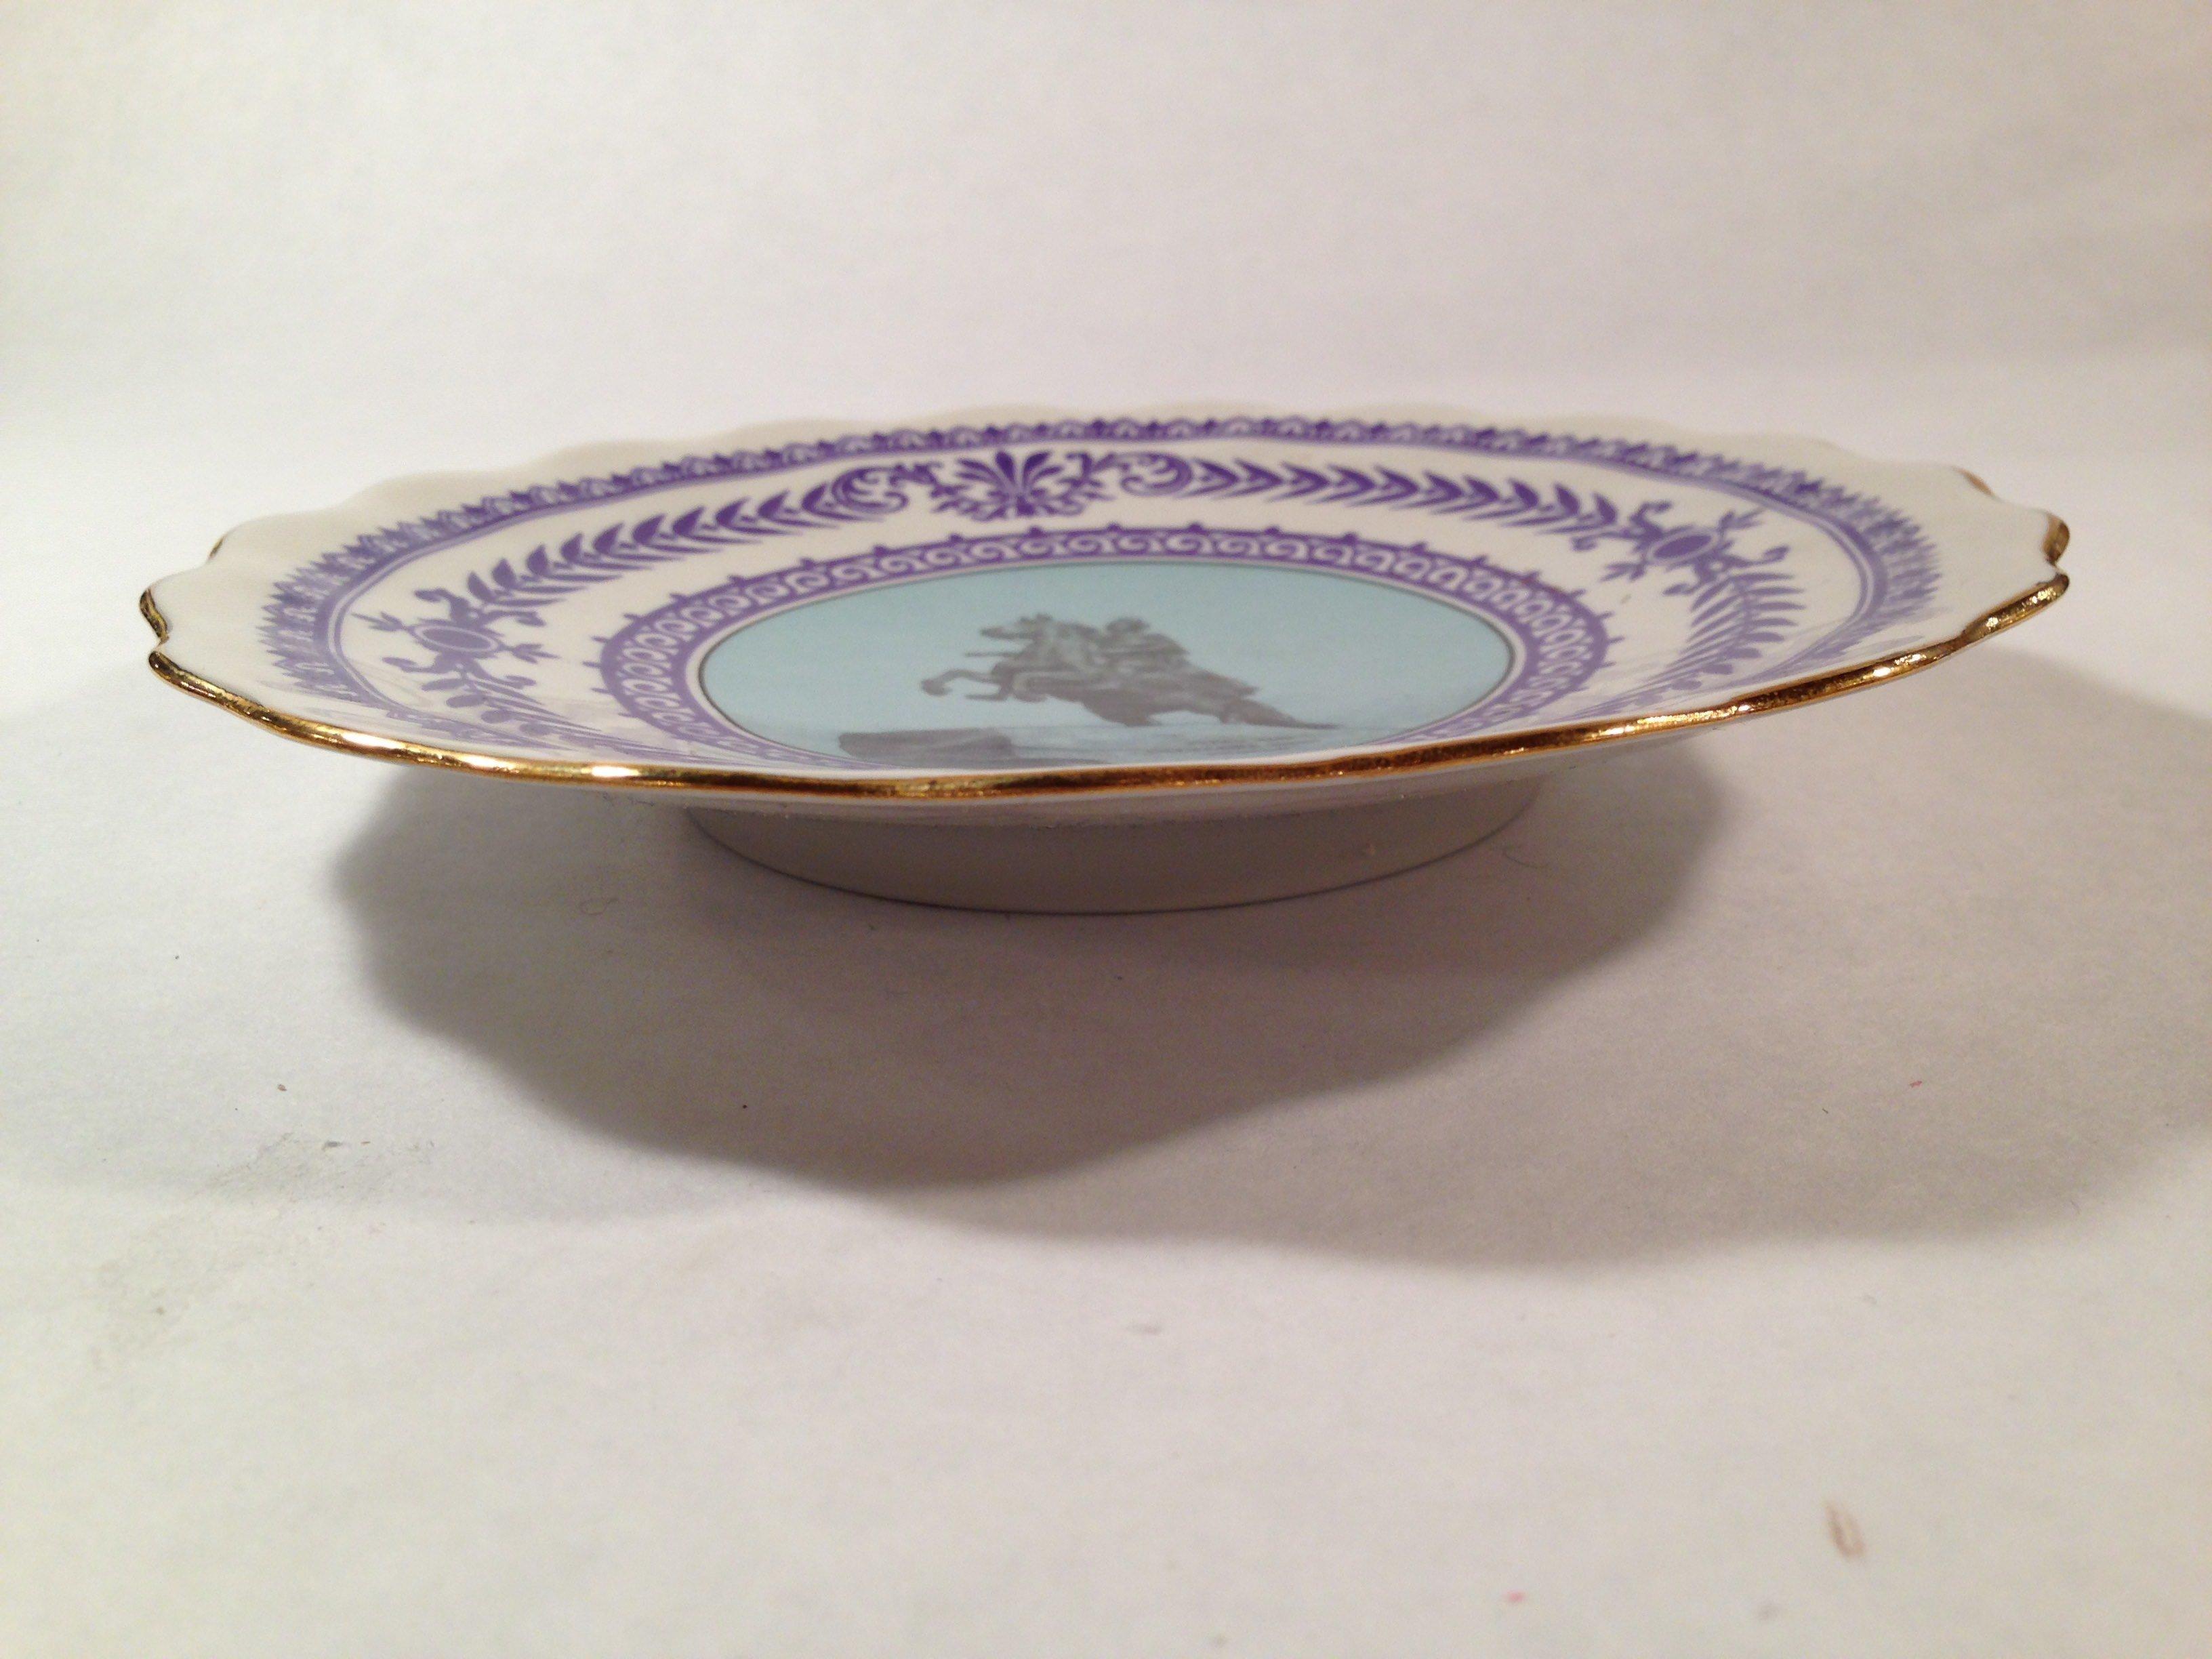 20% OFF - Souvenir Plate St. Petersburg RUSSIA Catherine the Great - Summer Garden